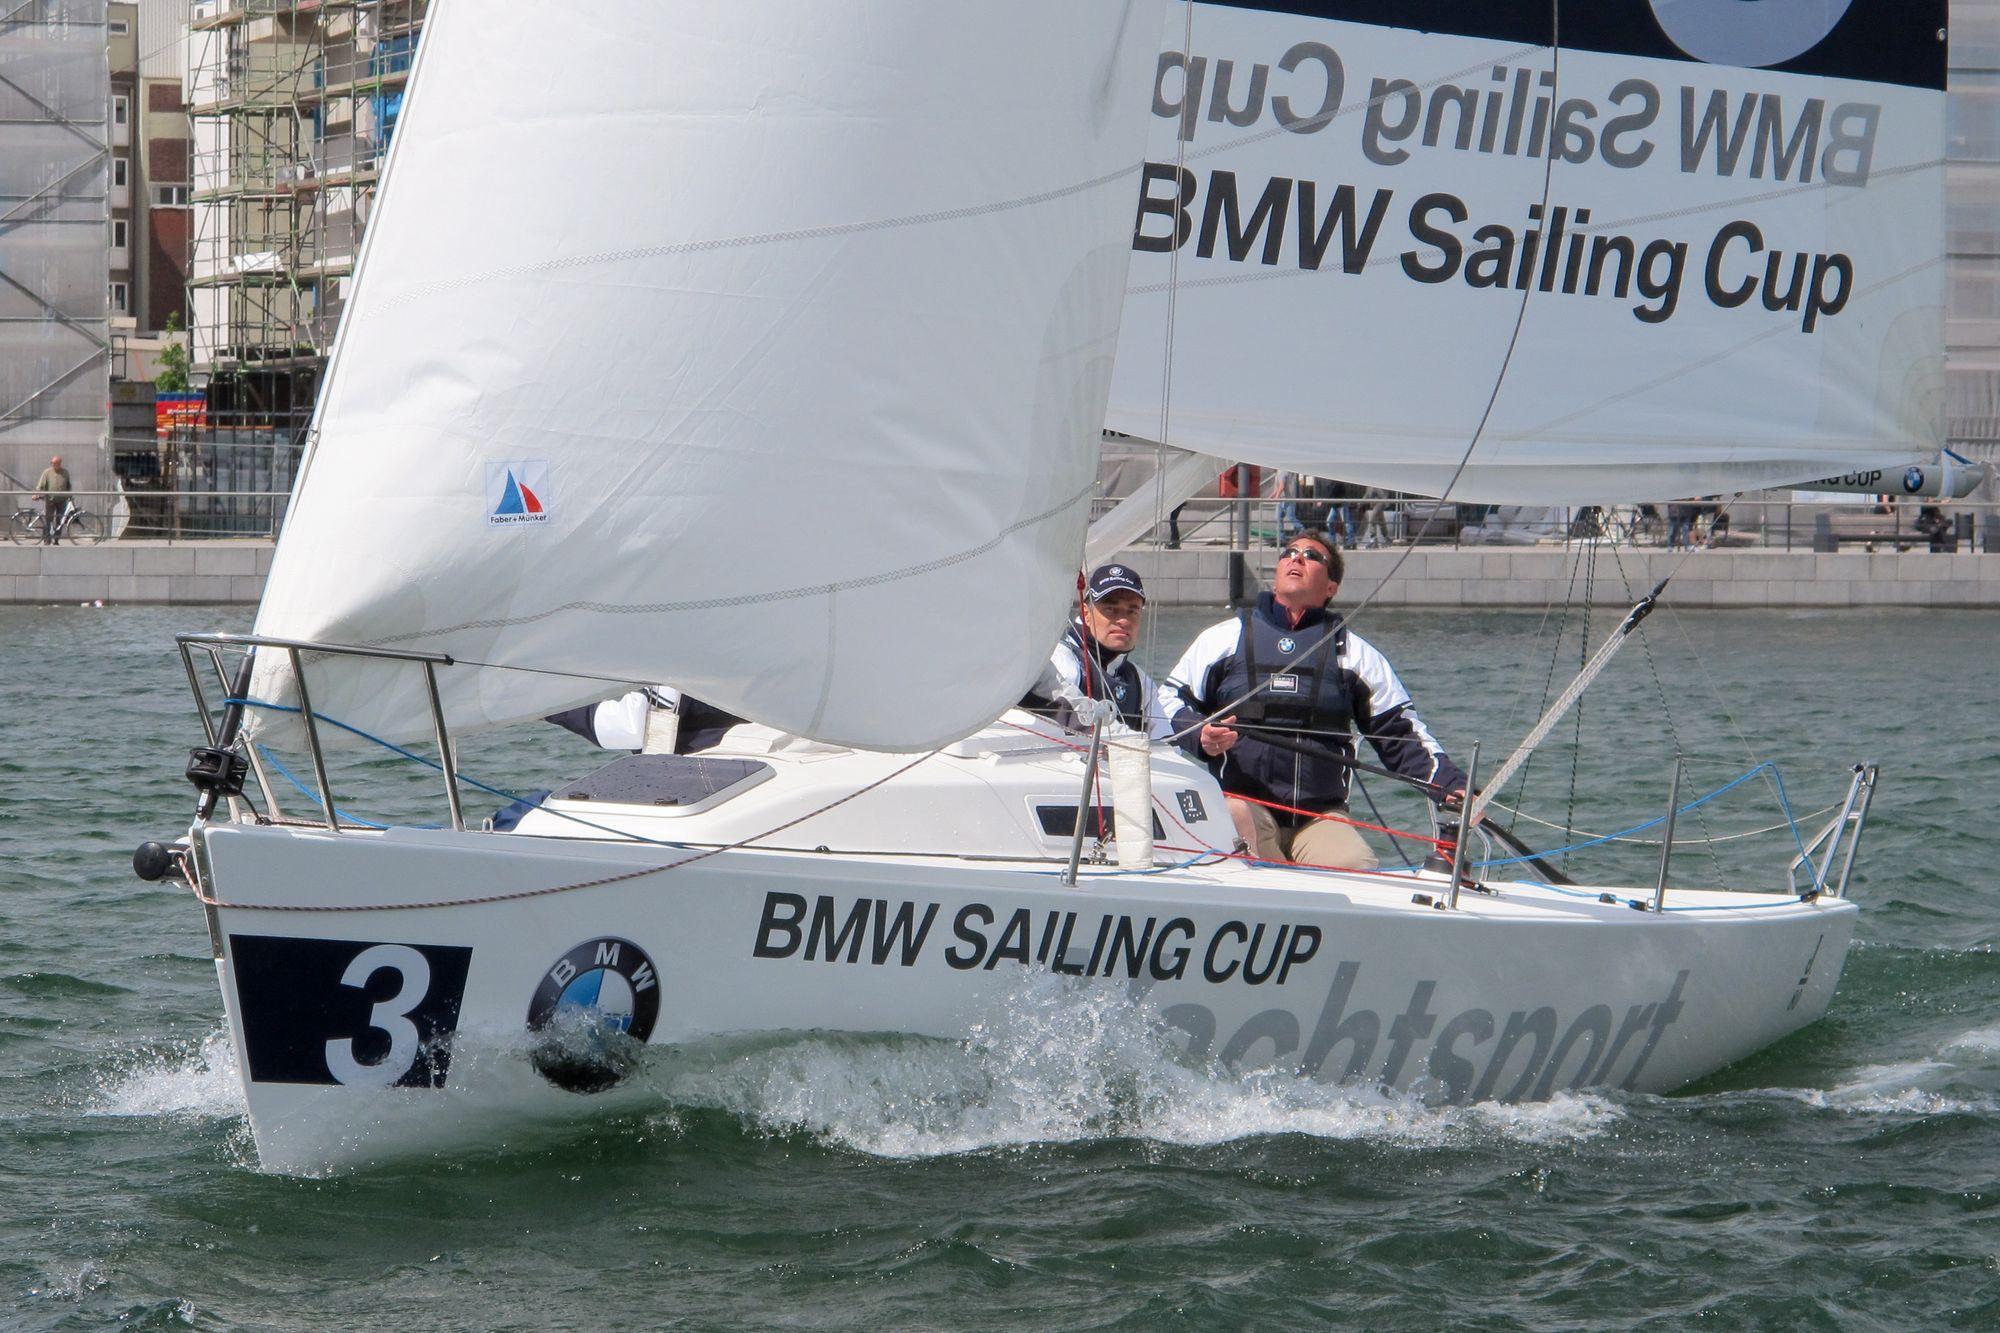 BMW Sailing Cup Dortmund Phoenixsee 2012